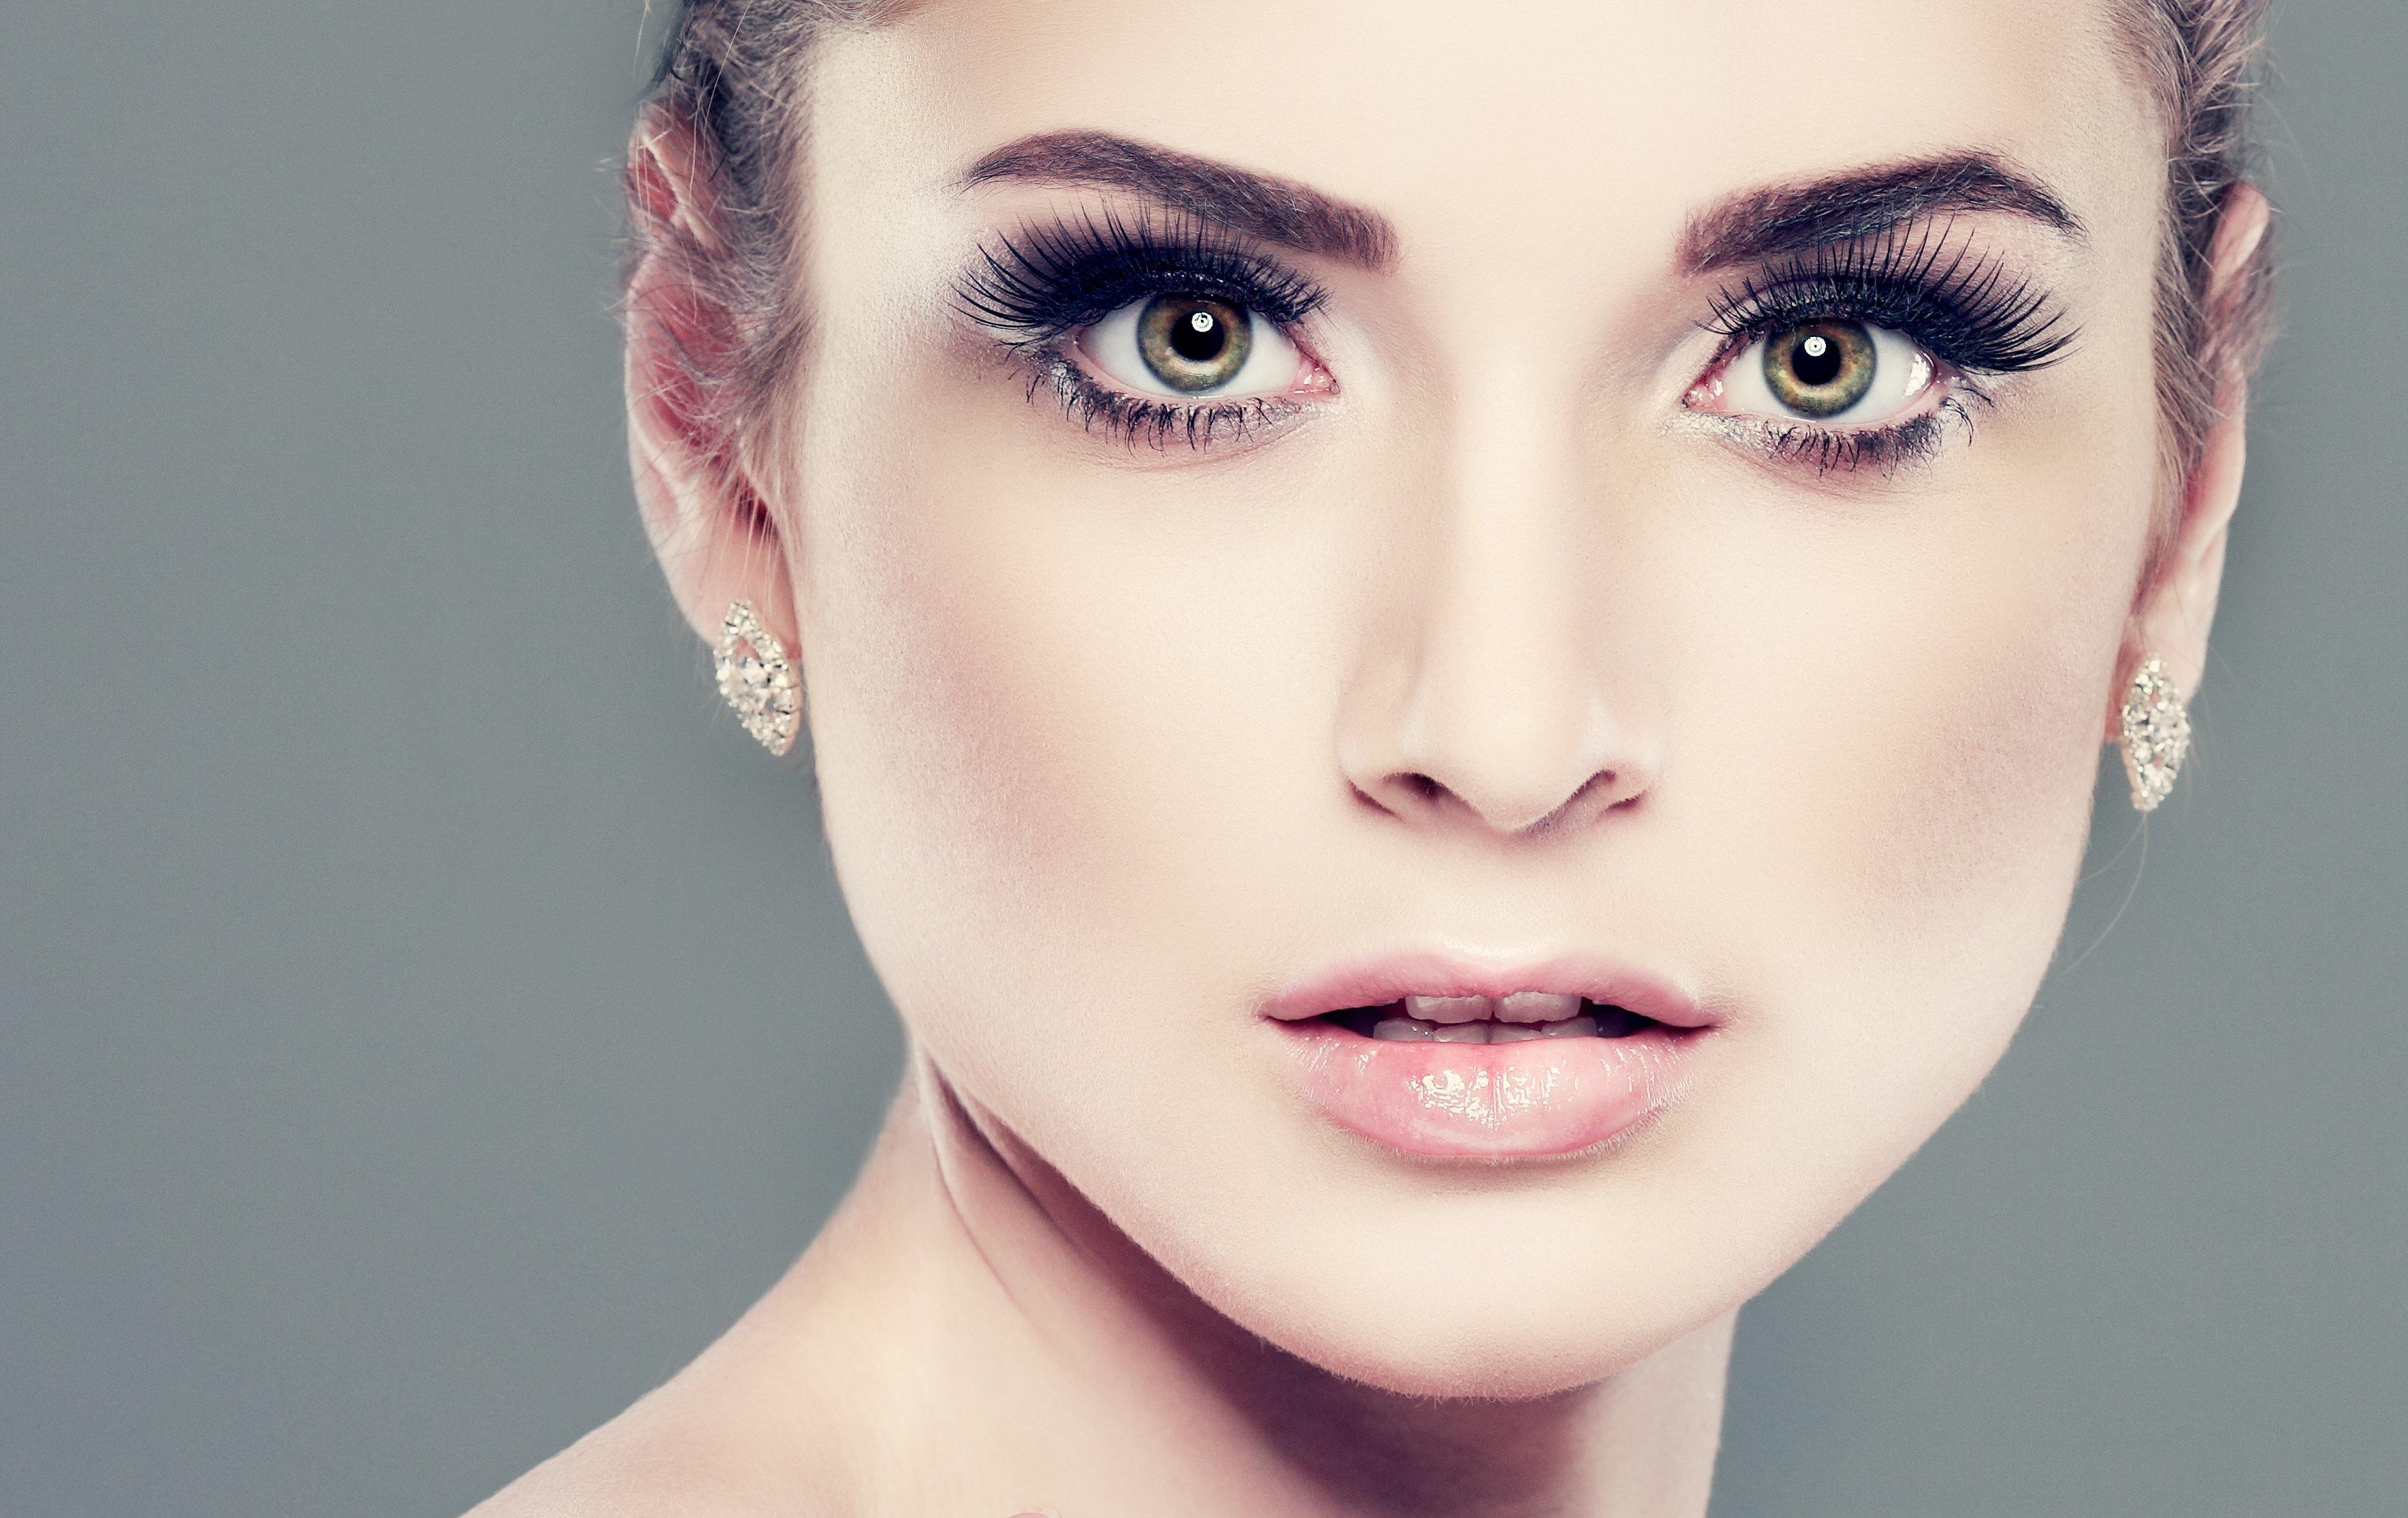 Download Wallpaper Girl Eyelashes Hair Earrings Lips Green Eyes